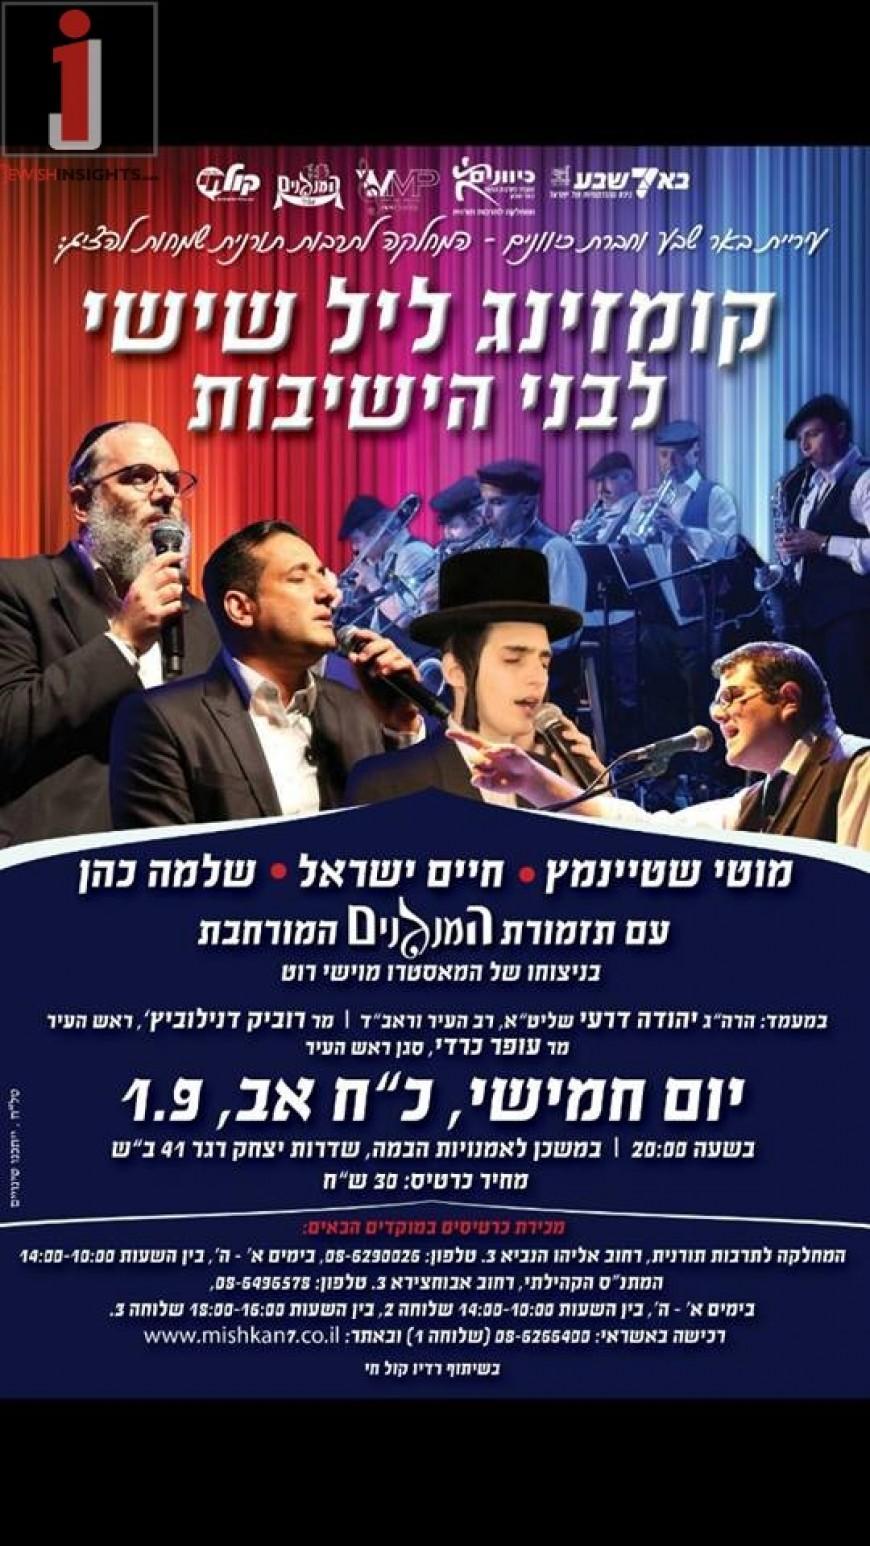 Kumzing With The HaMenagnim Orchestra Shloime Cohen, Motty Steinmeitz & Chaim Israel